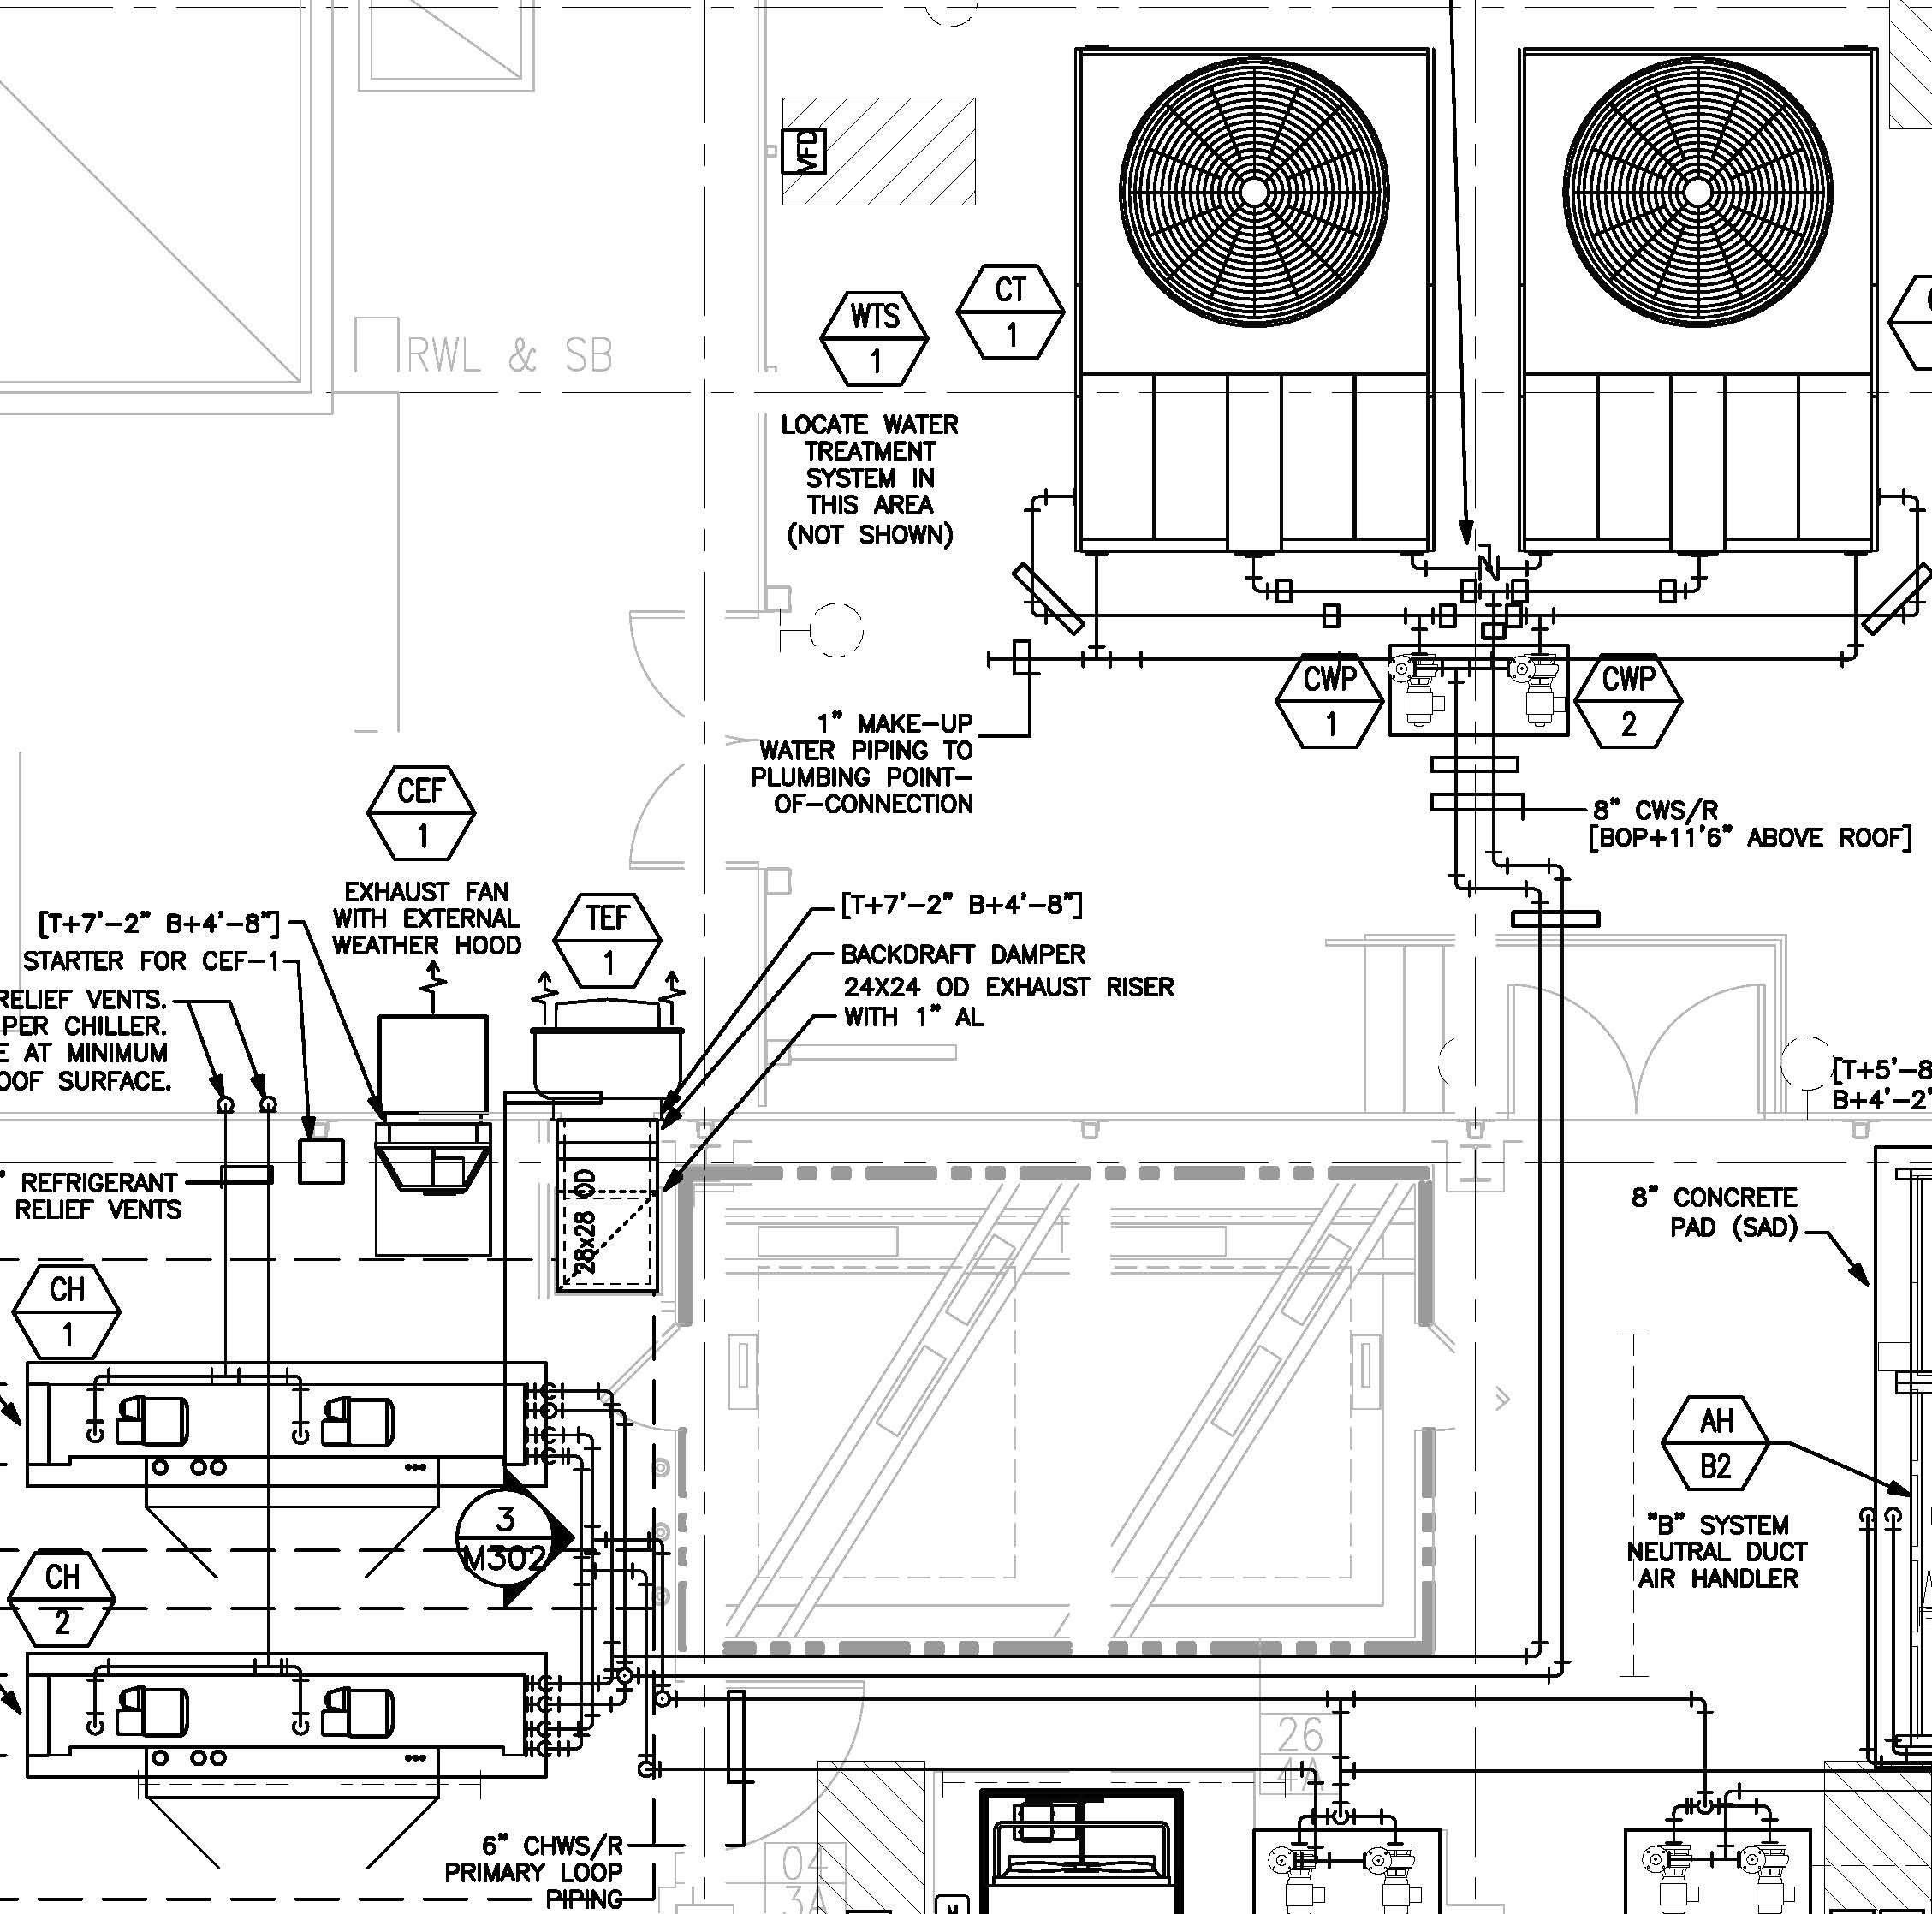 1986 club car wiring diagram unique 48v golf cart wiring schematic explained wiring diagrams of 1986 club car wiring diagram